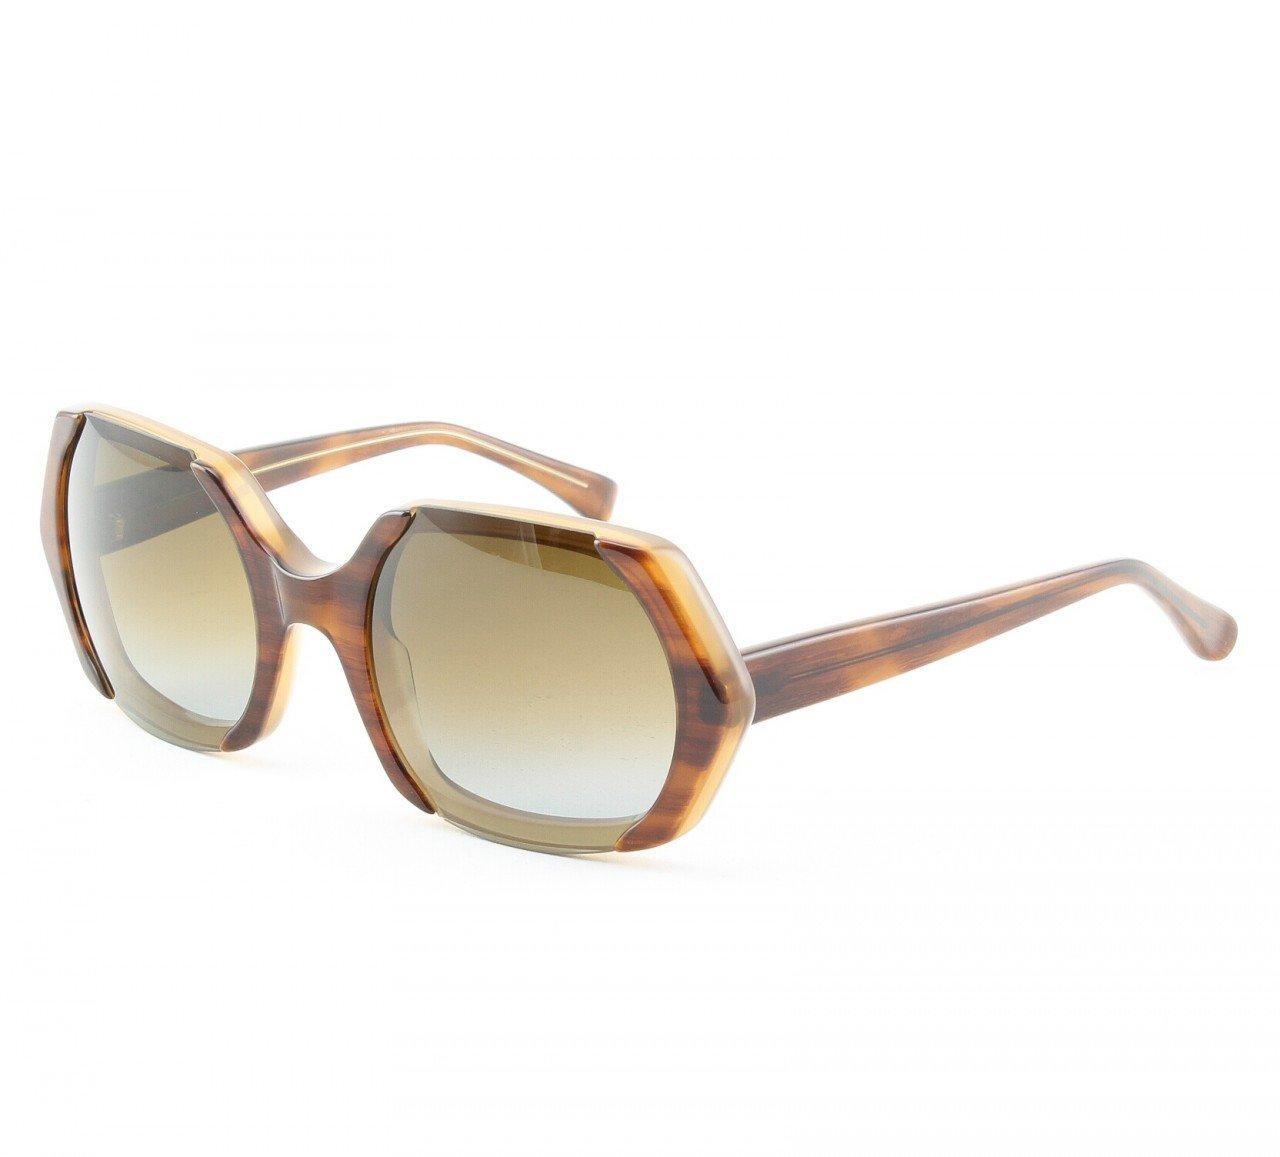 Marni MA223 Sunglasses Col. 05 Hi Tech Tortoise Frame with Brown Lenses